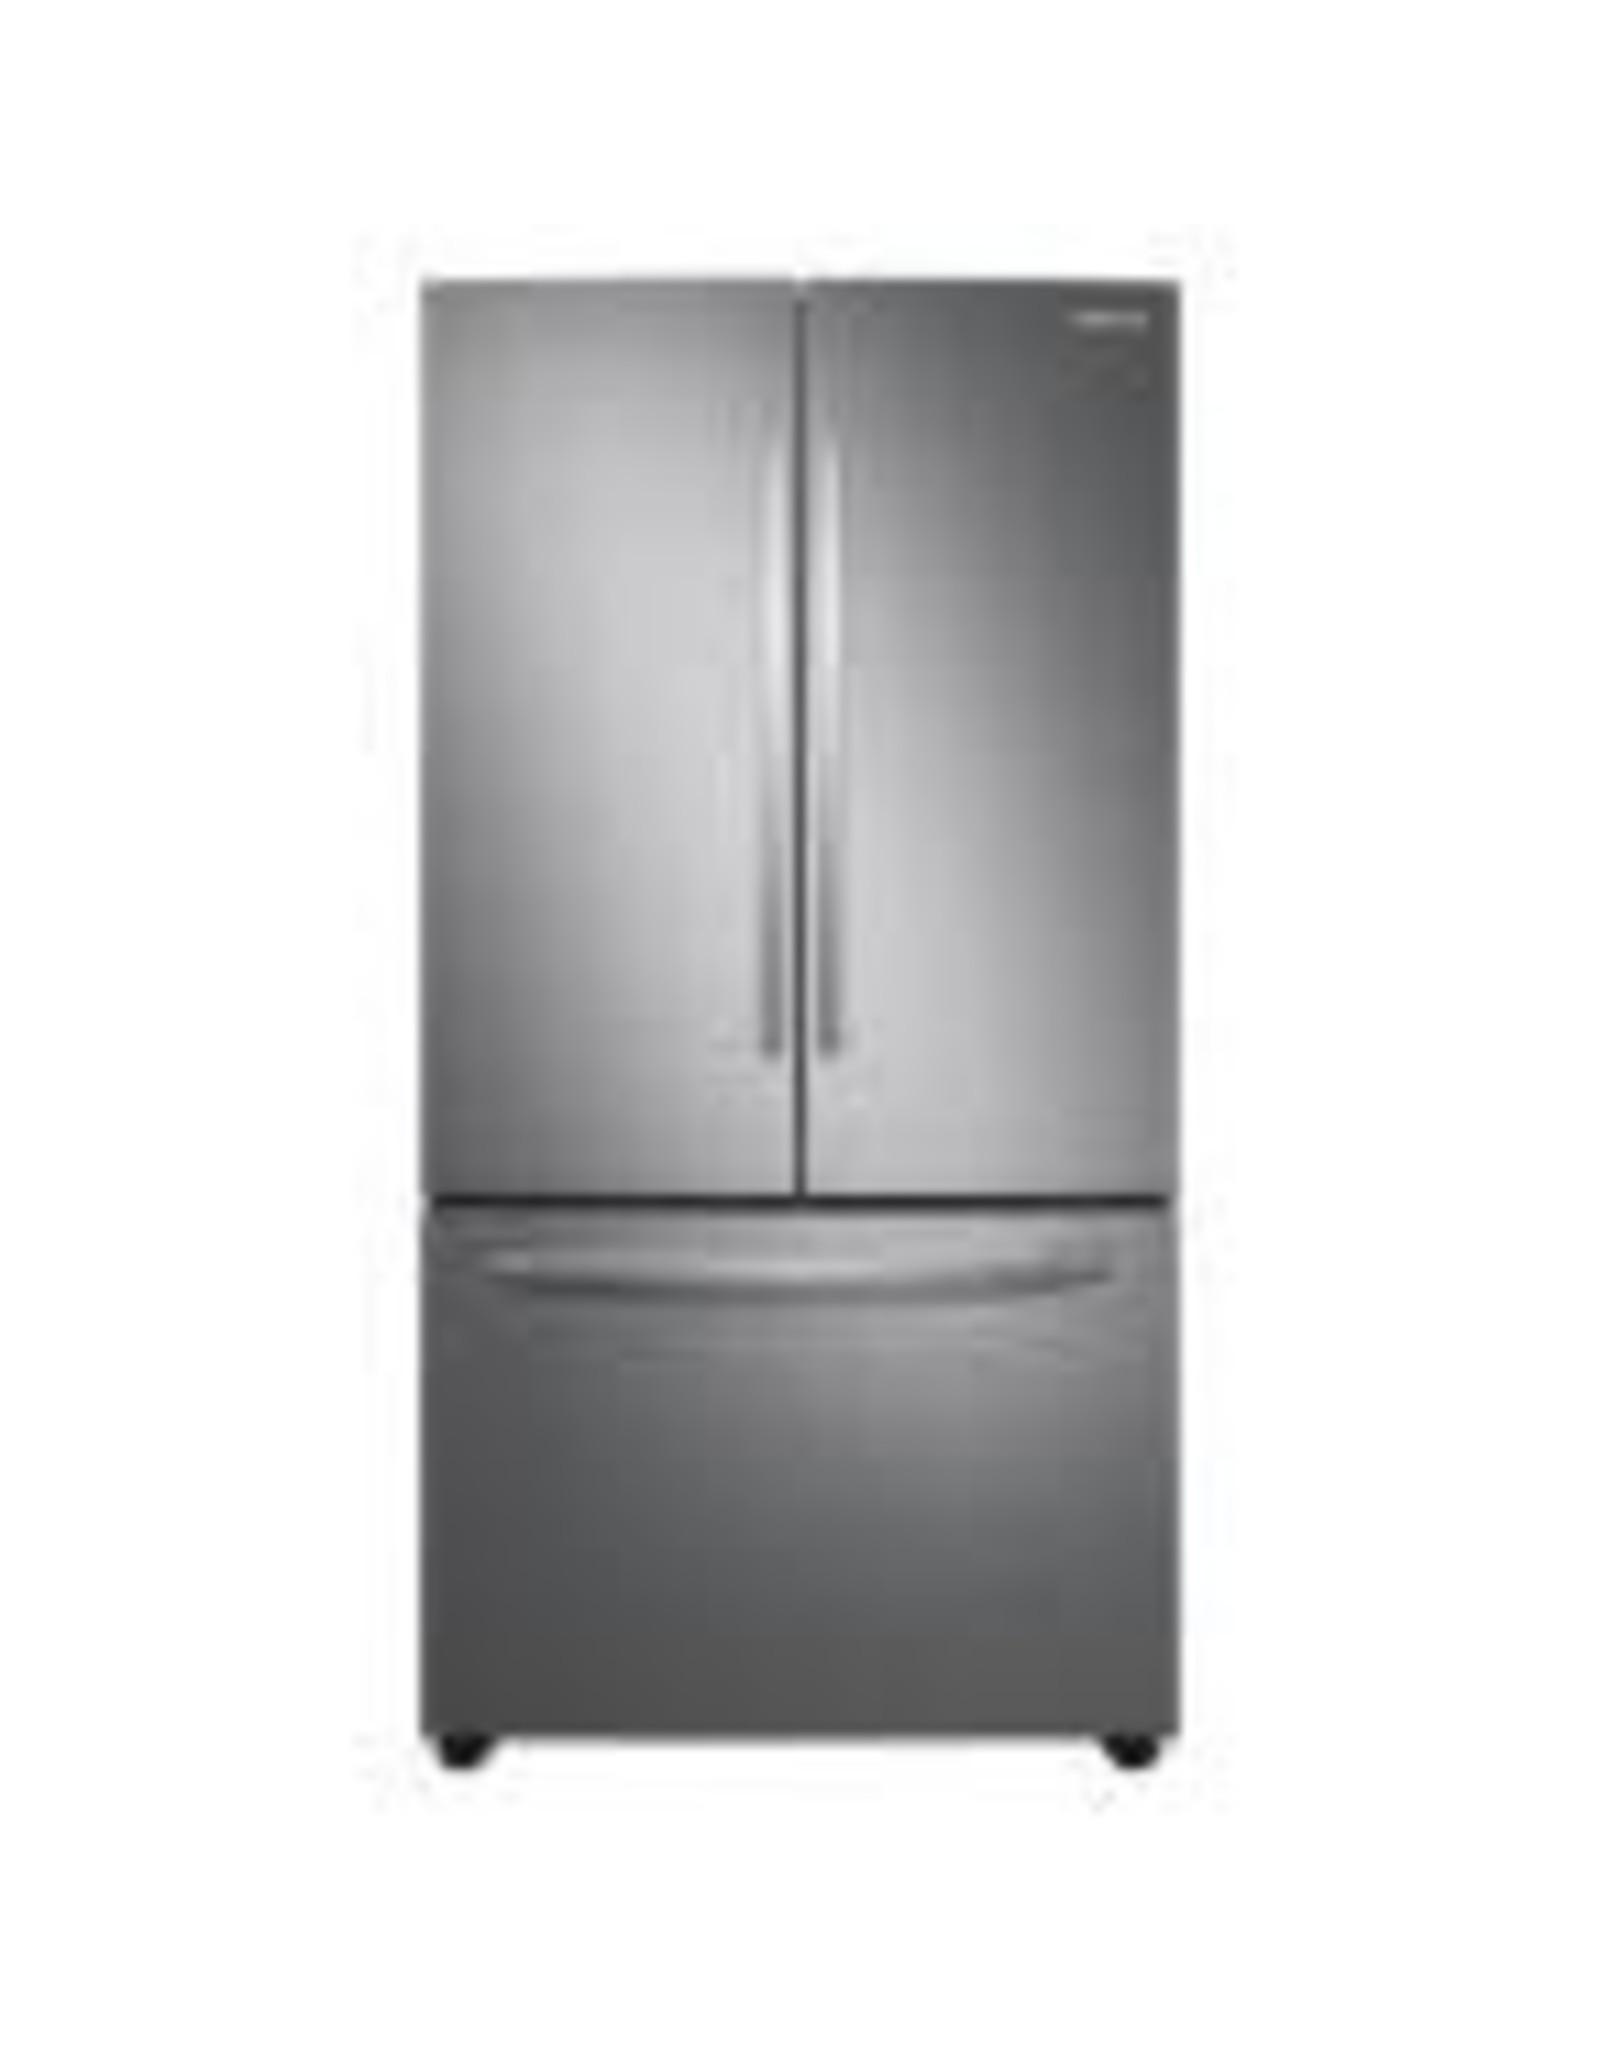 SAMSUNG RF28T5001SR 28.2 cu. ft French Door Refrigerator in Stainless Steel